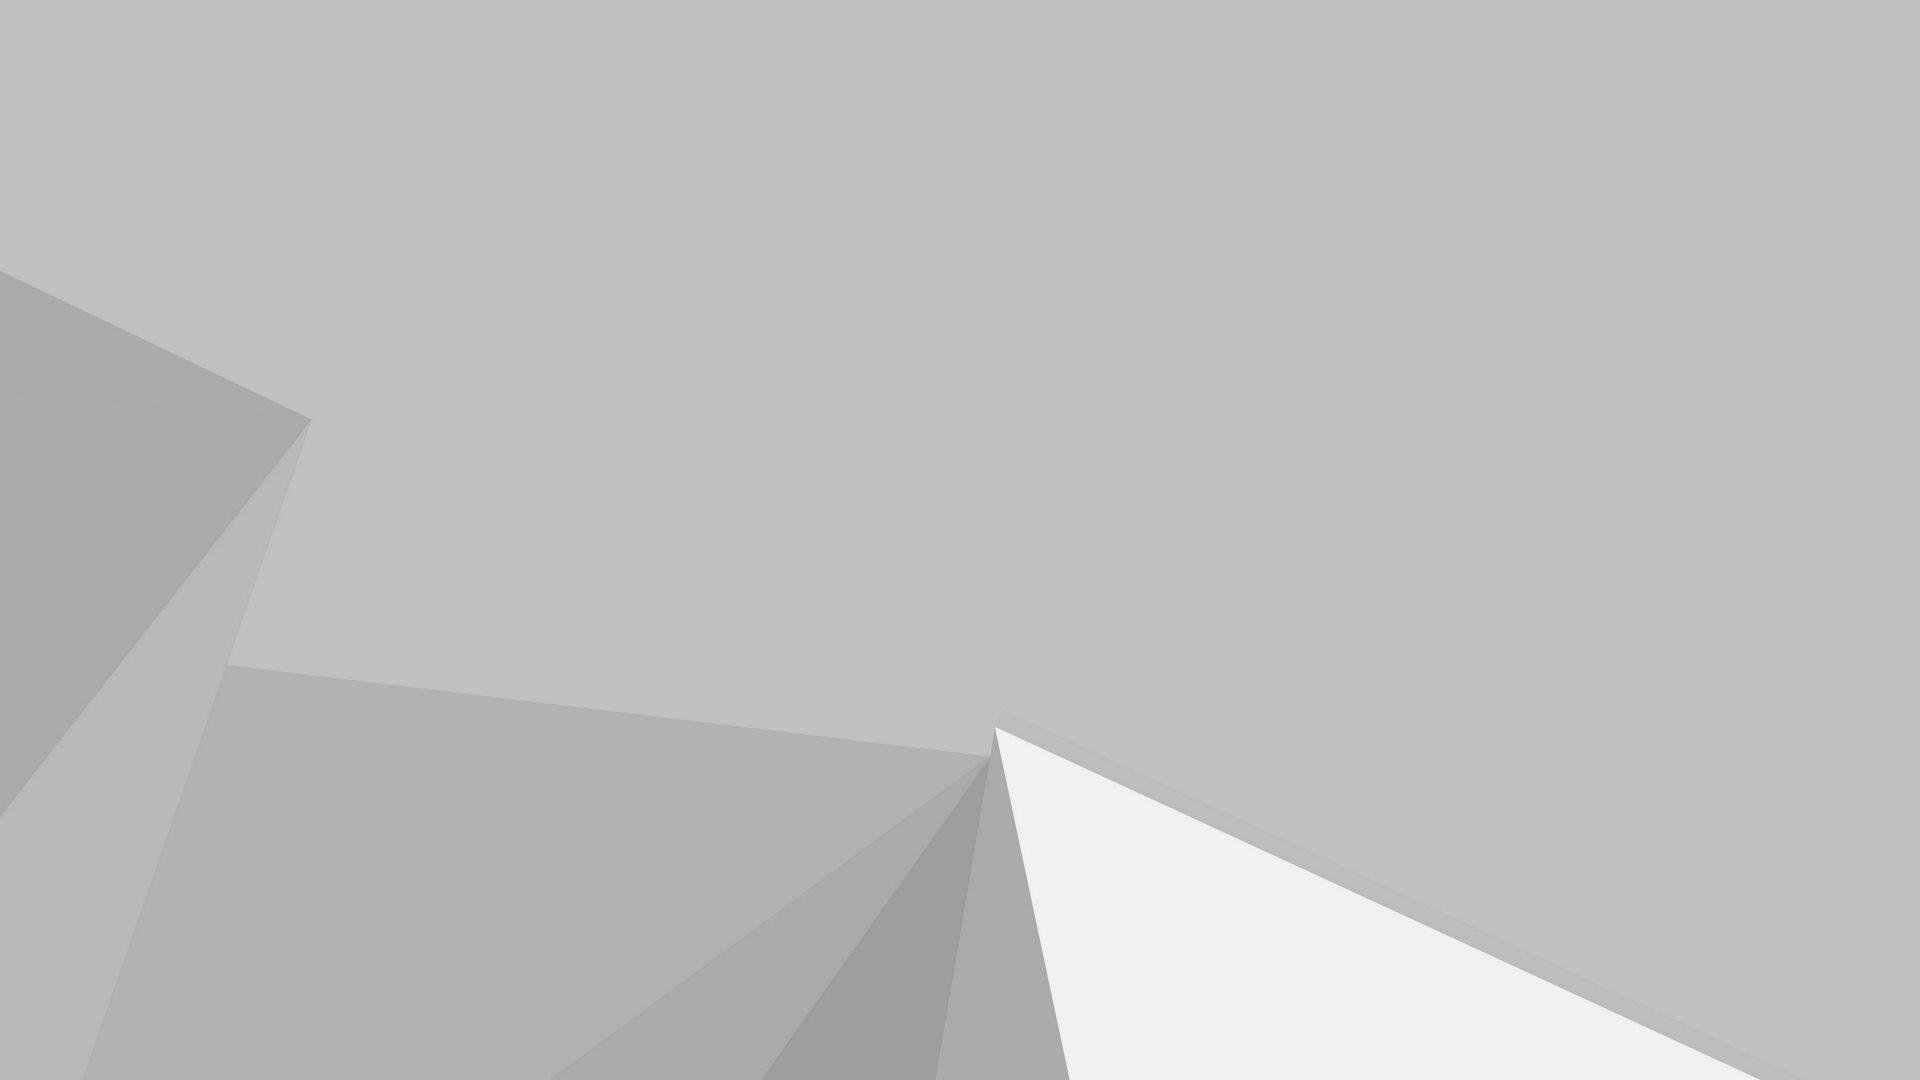 Wallpaper: Minimal Windows 8.1 White